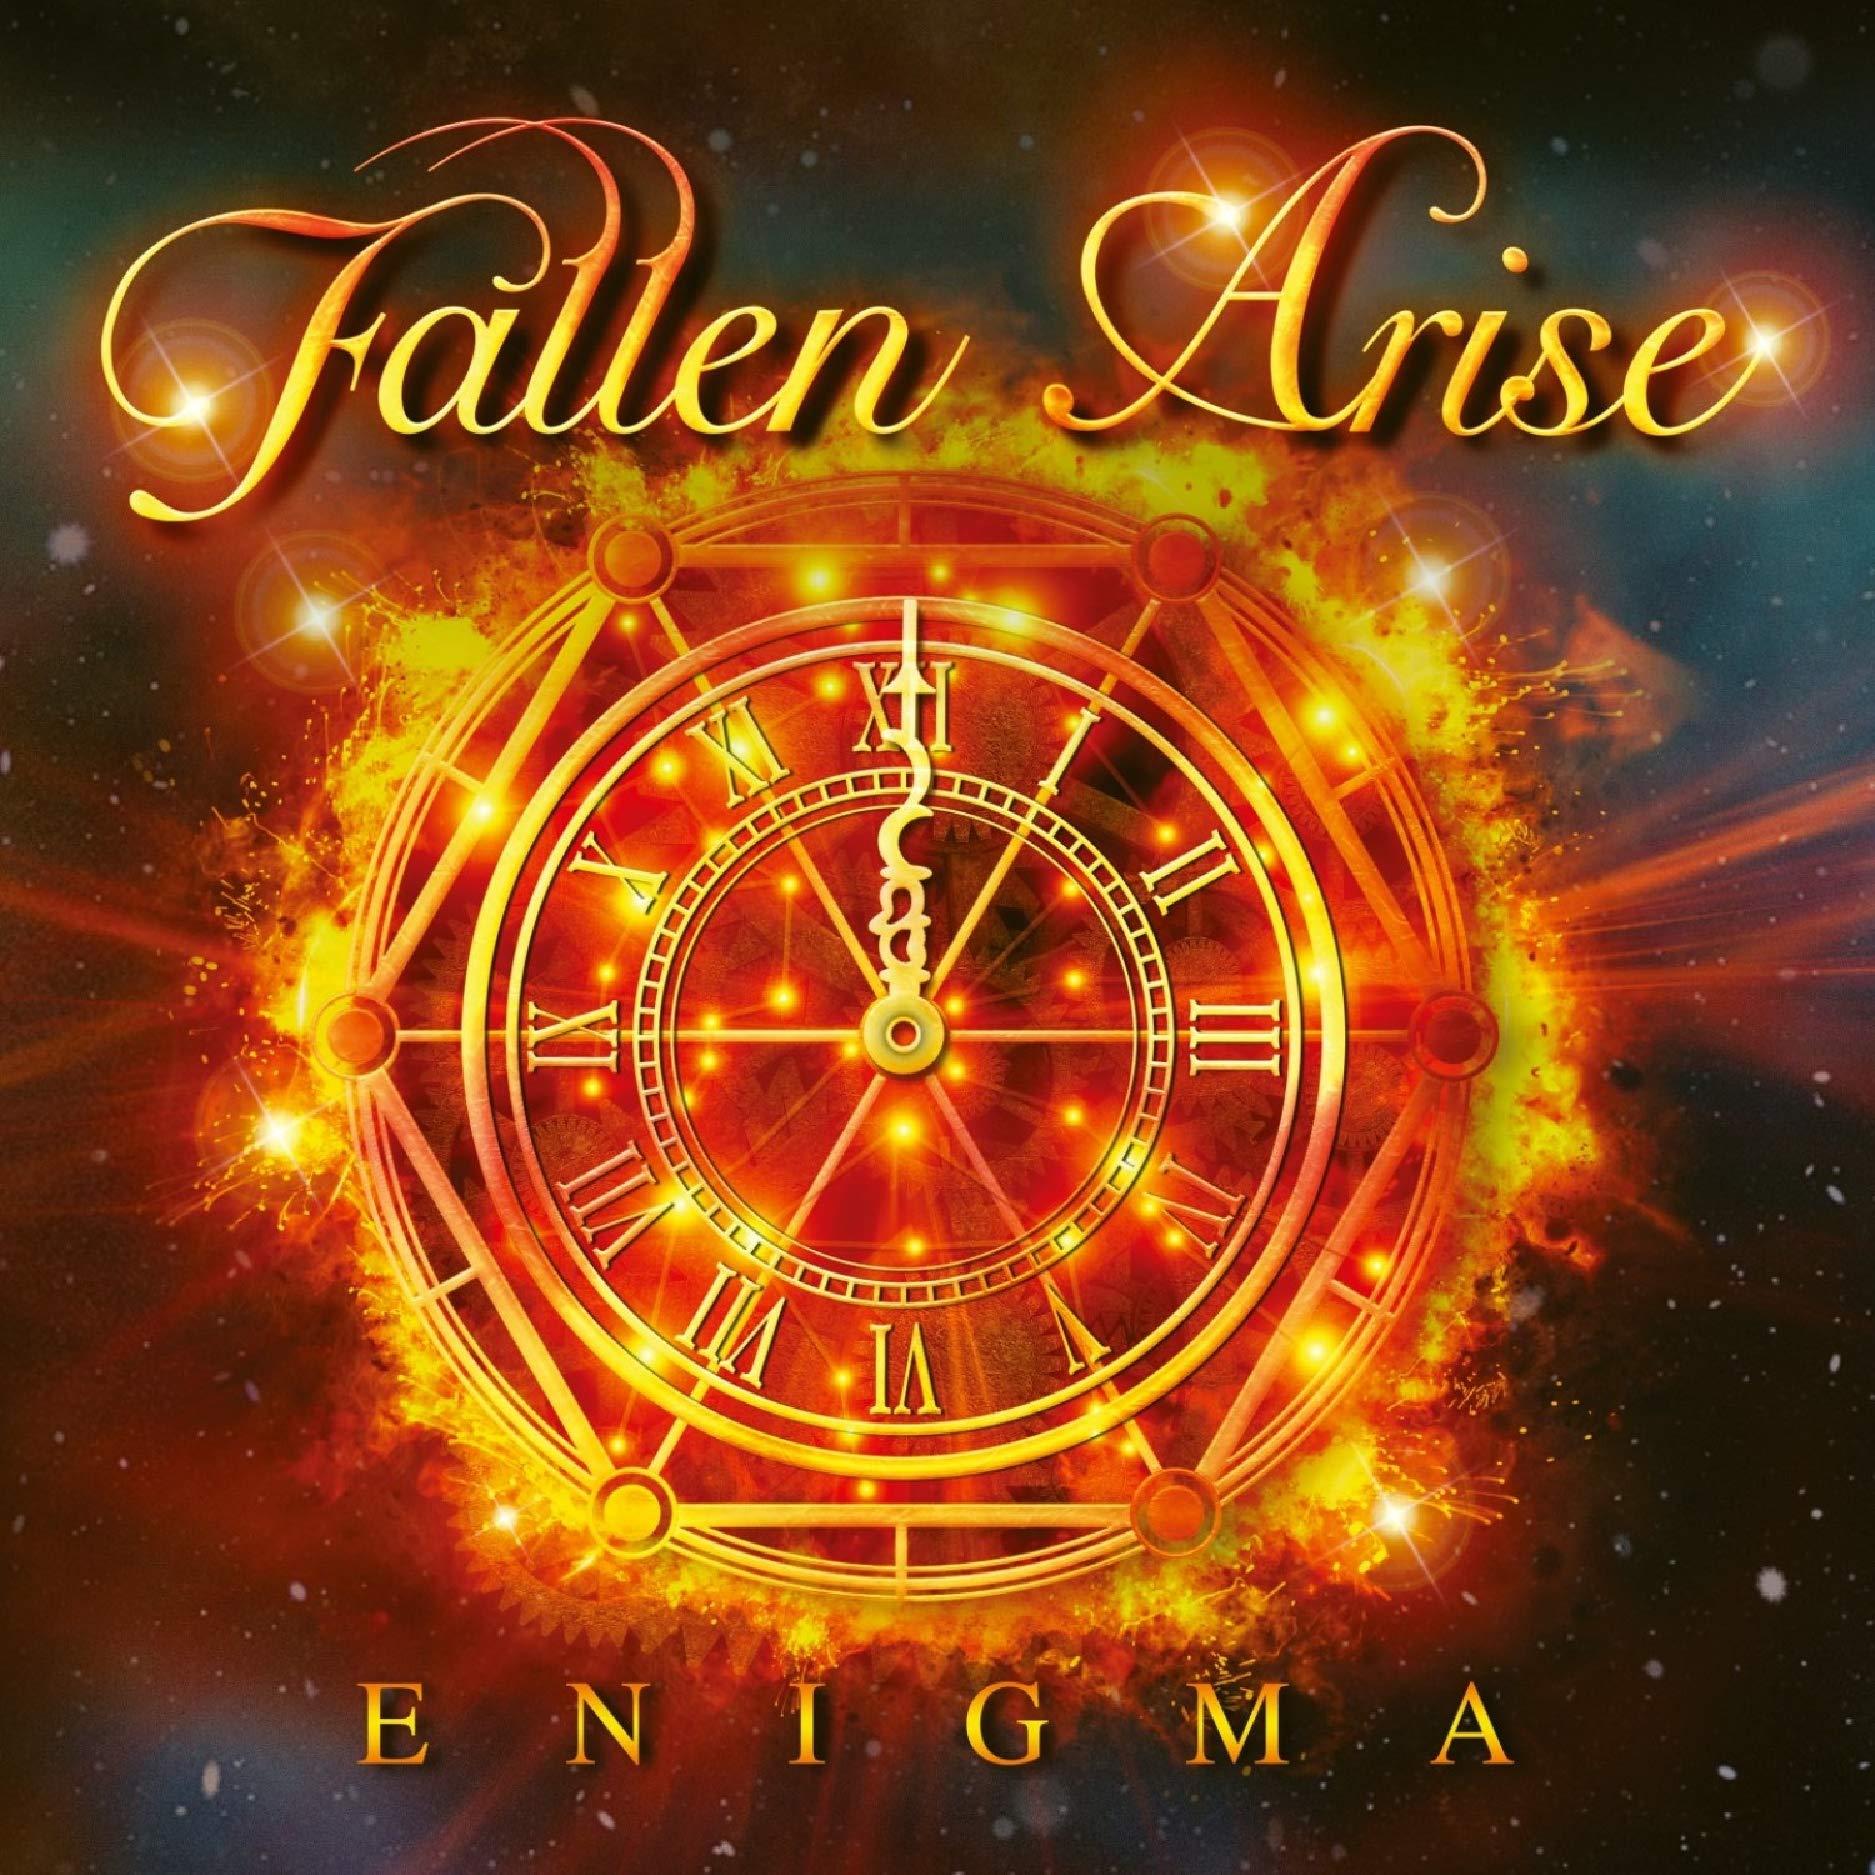 Fallen Arise - Enigma (2020) [FLAC] Download